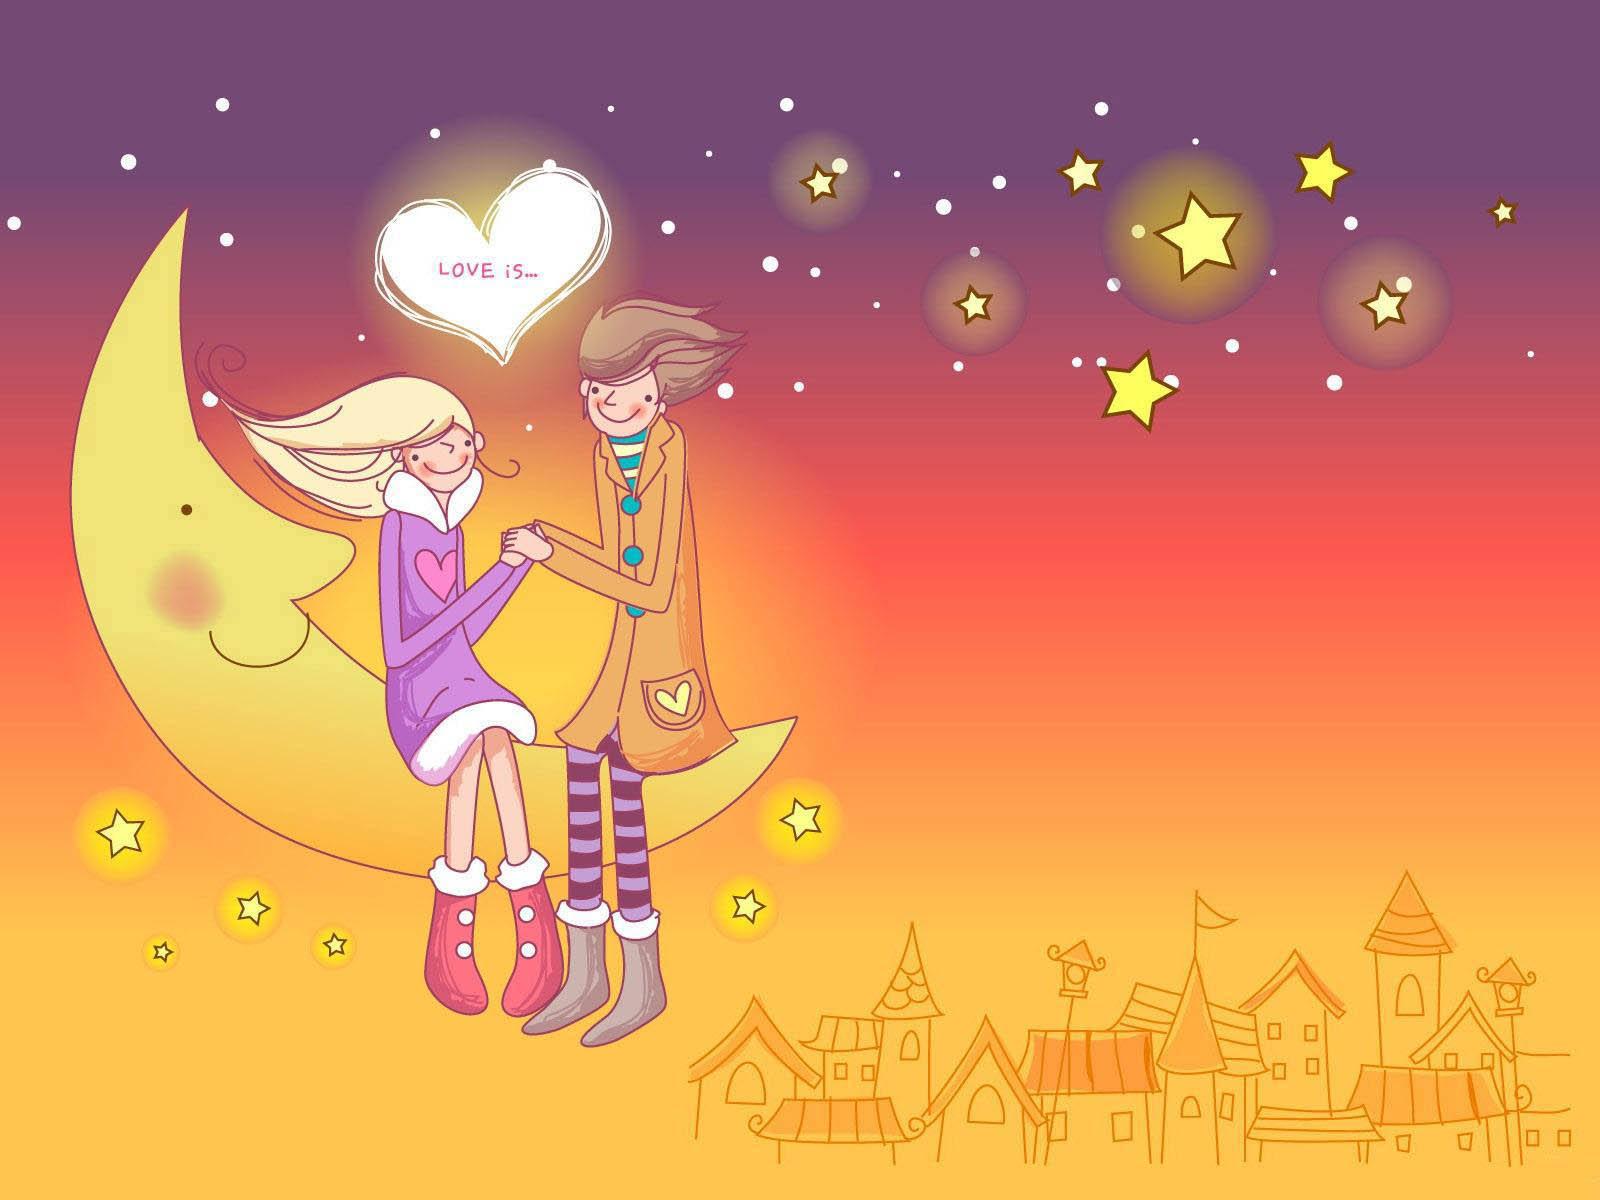 romantic love backgrounds - photo #4